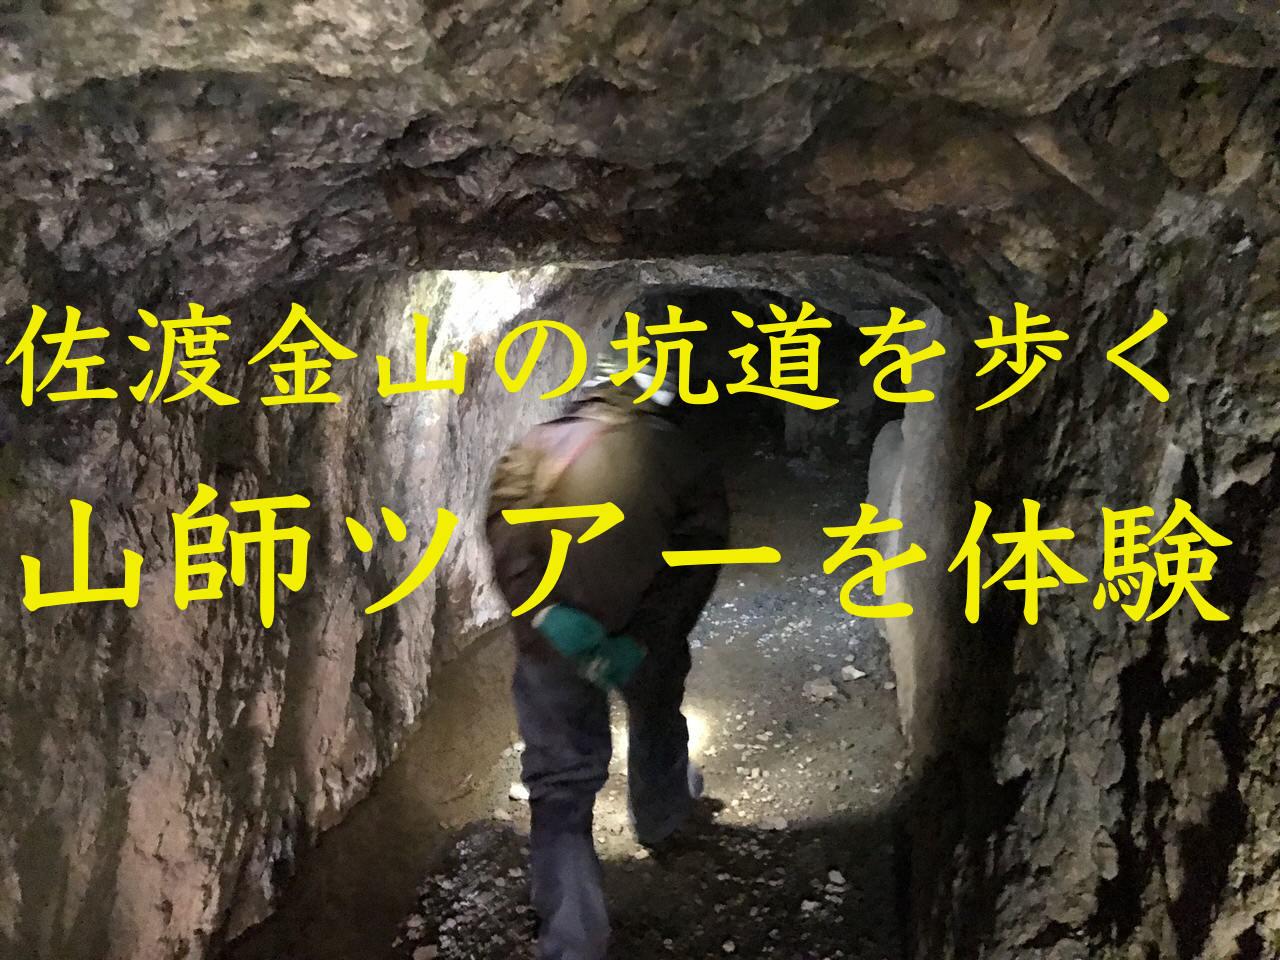 Sado travel kinzan yamashi 00915t 1